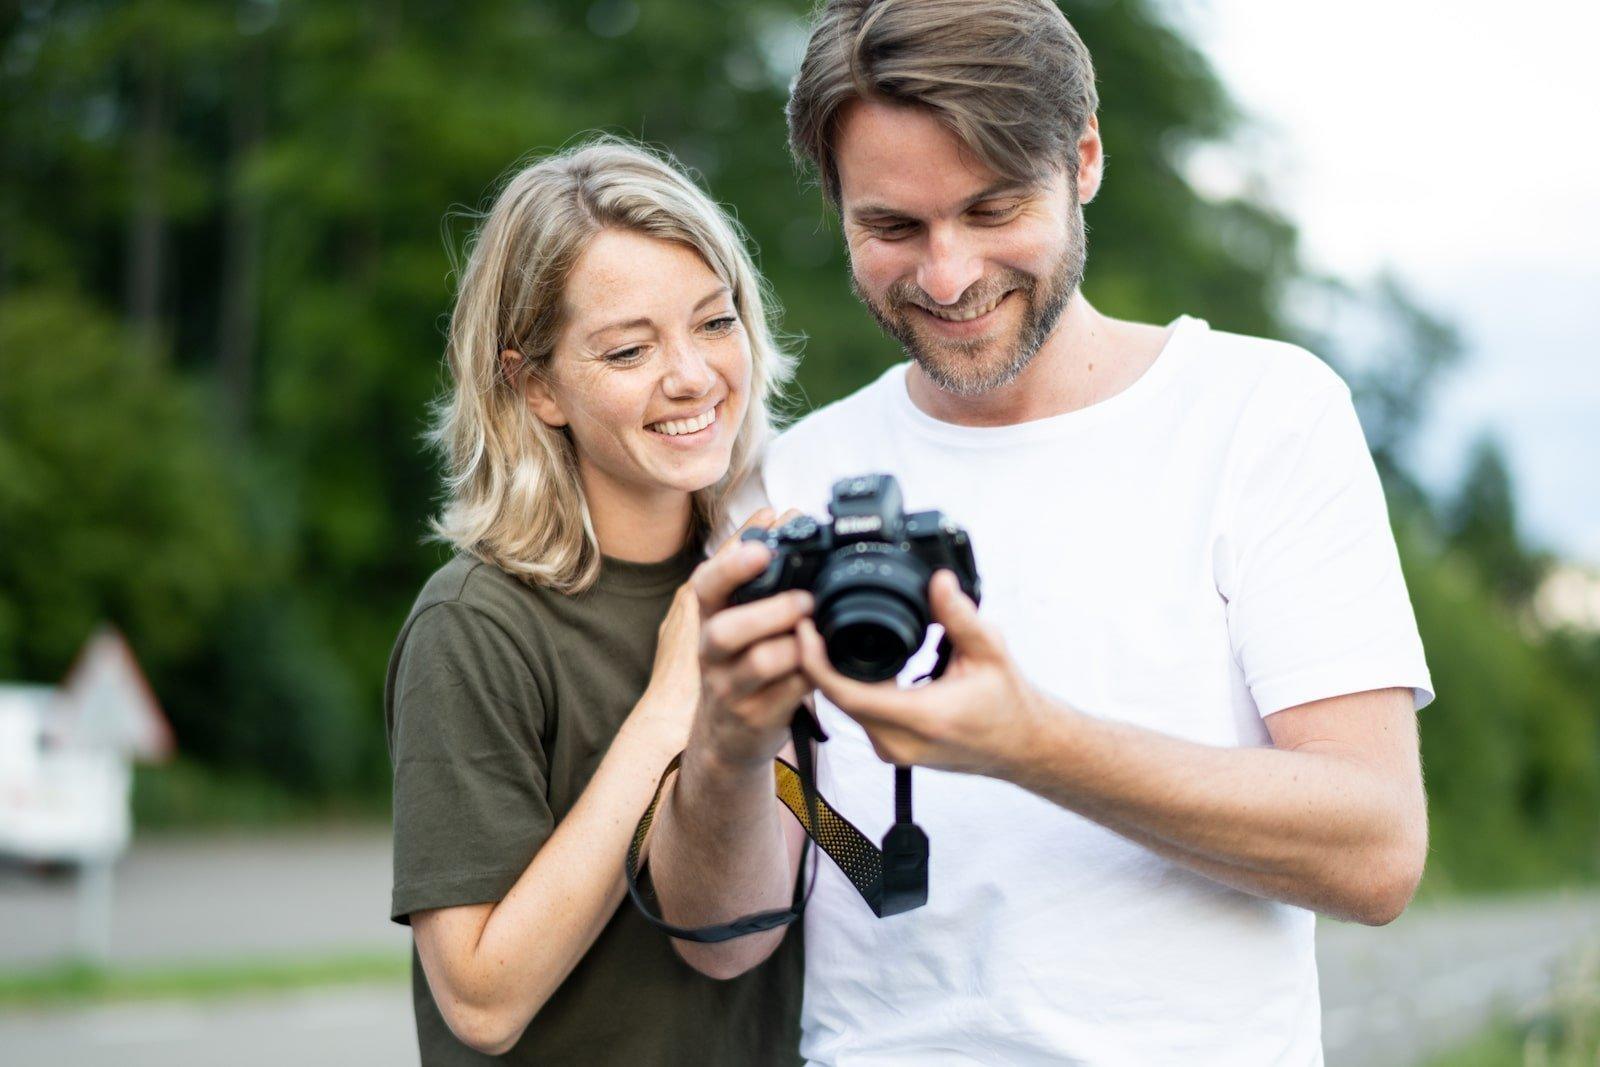 Reisfotografie tips voor mooiere foto's - by NOMADS